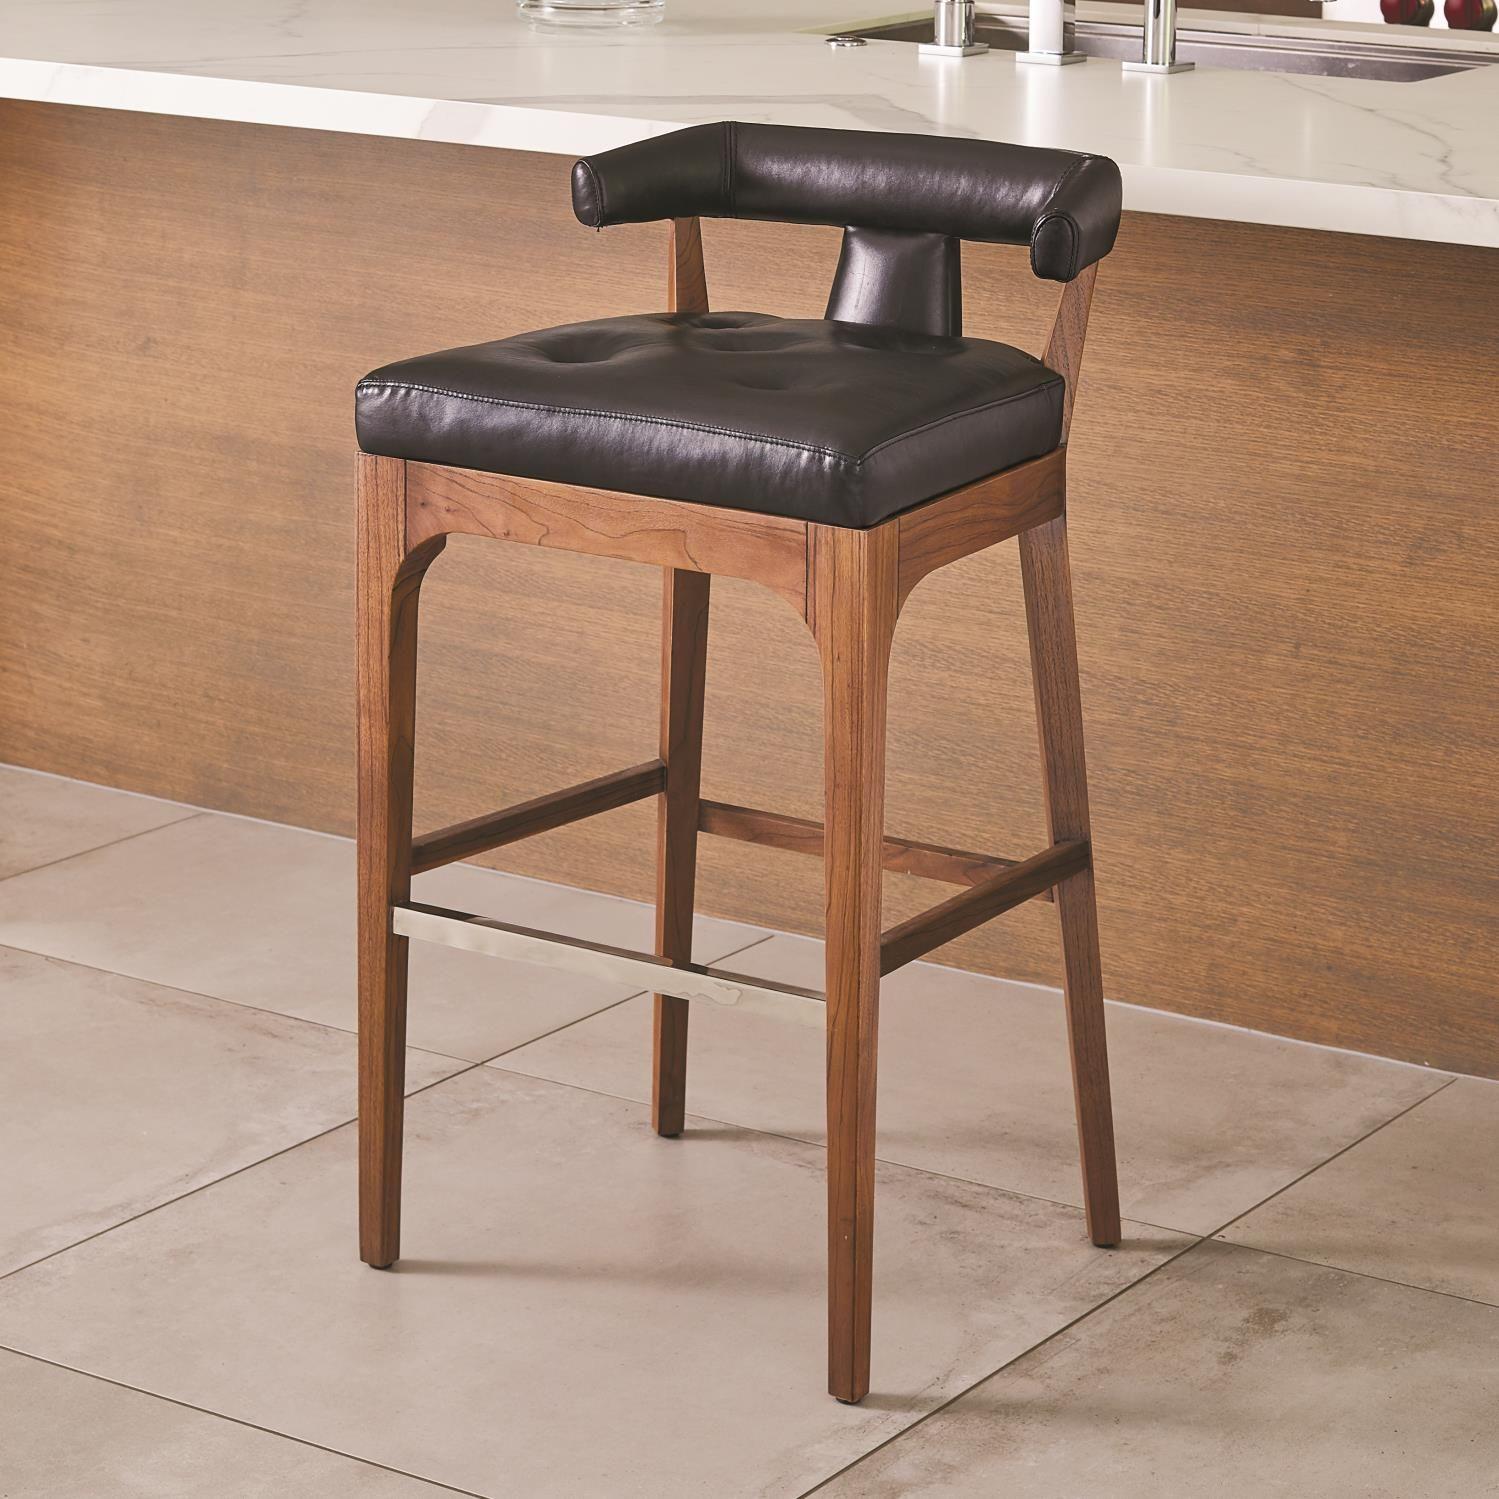 Moderno Bar Stool Black Marble Leather Bar Stools Stool Dining